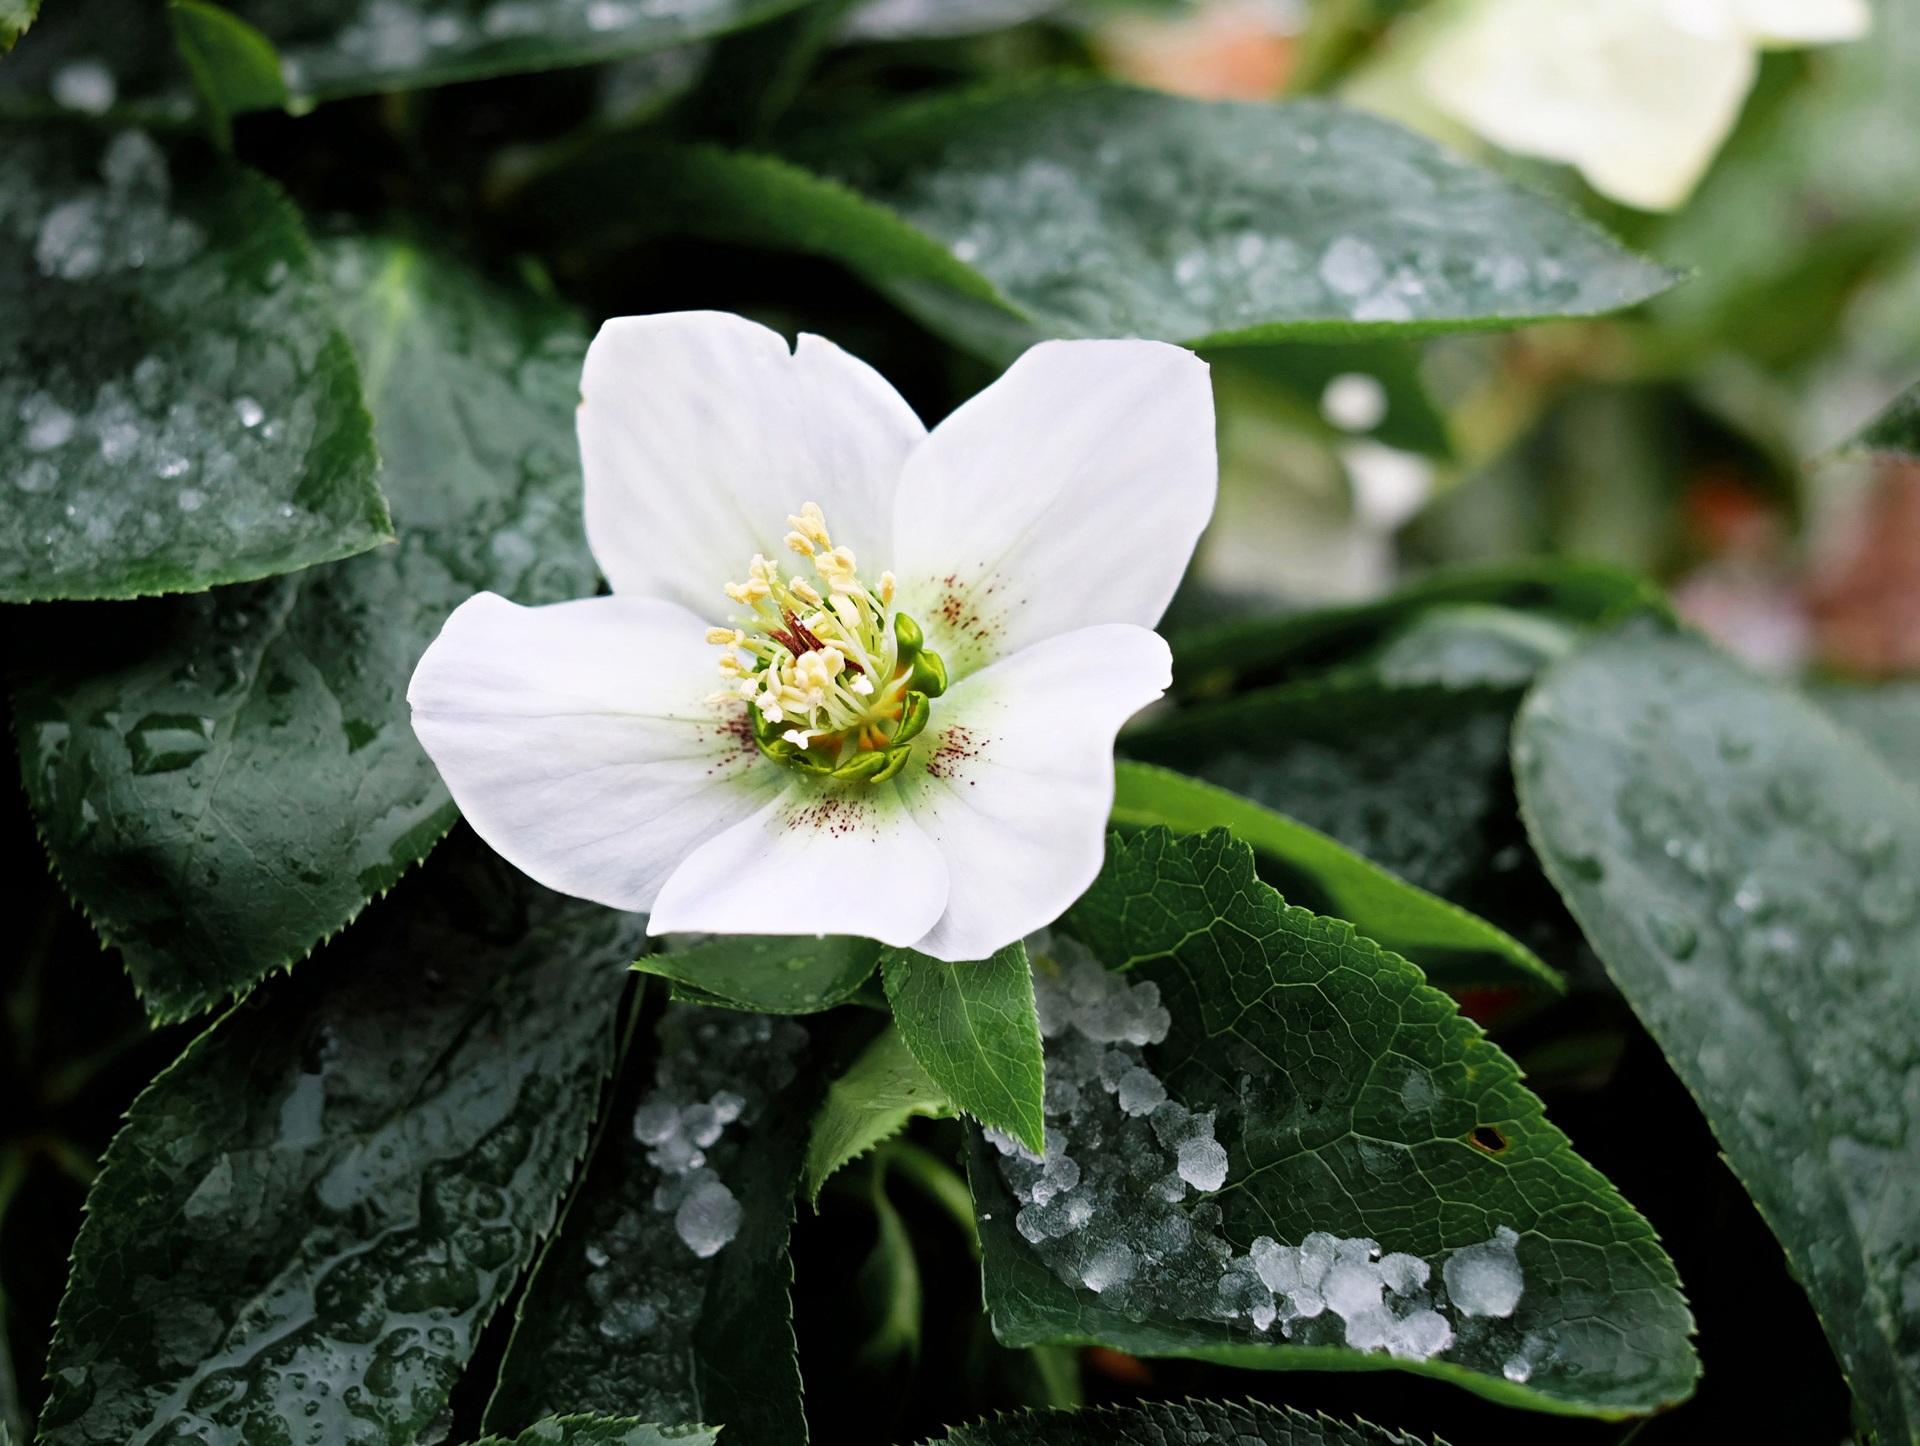 Kostenlose foto : Natur, blühen, Blatt, Blume, Blütenblatt, Grün ...